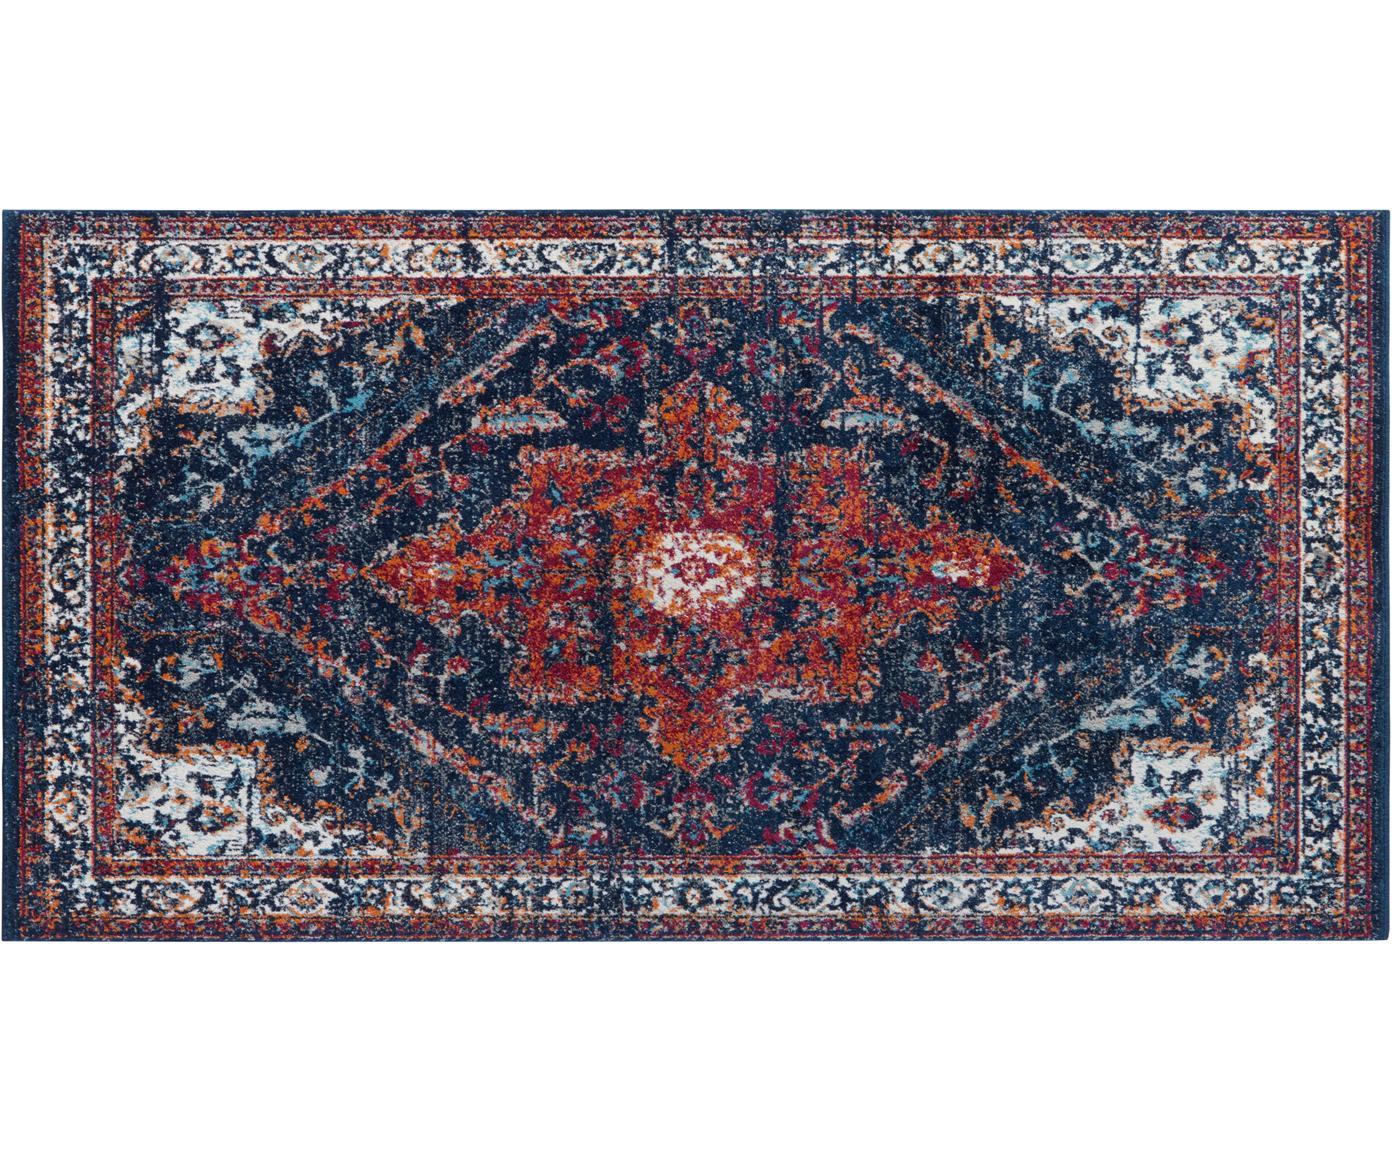 Teppich Azrow im Vintage Style, Flor: 100% Polypropylen, Dunkelblau, Rot, B 80 x L 150 cm (Grösse XS)